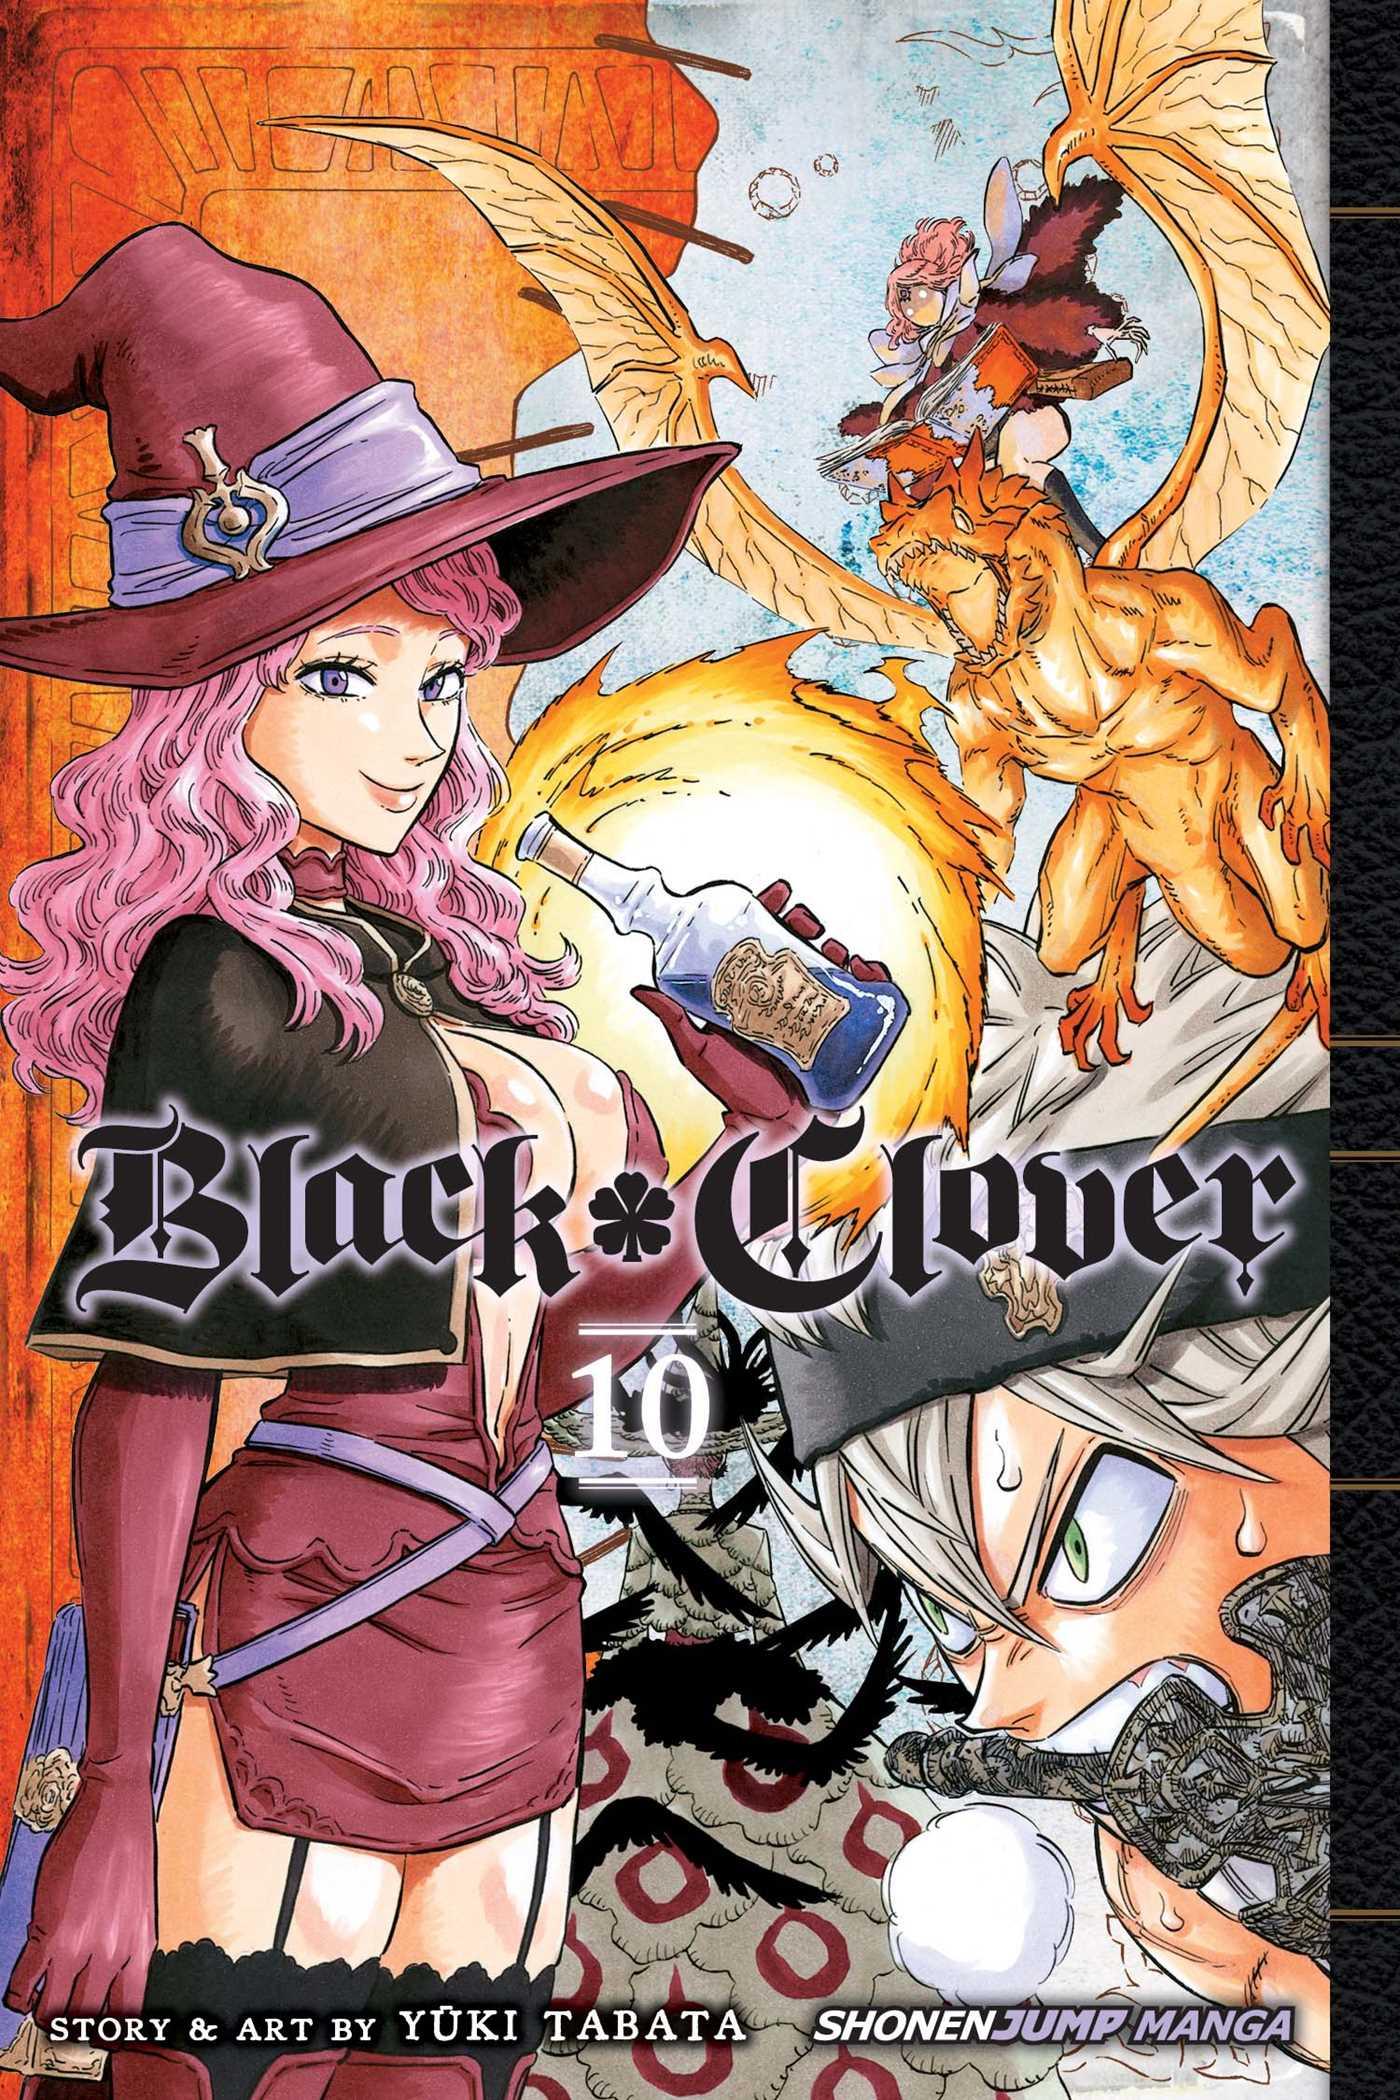 Black Clover Vol 10 Book By Yuki Tabata Official